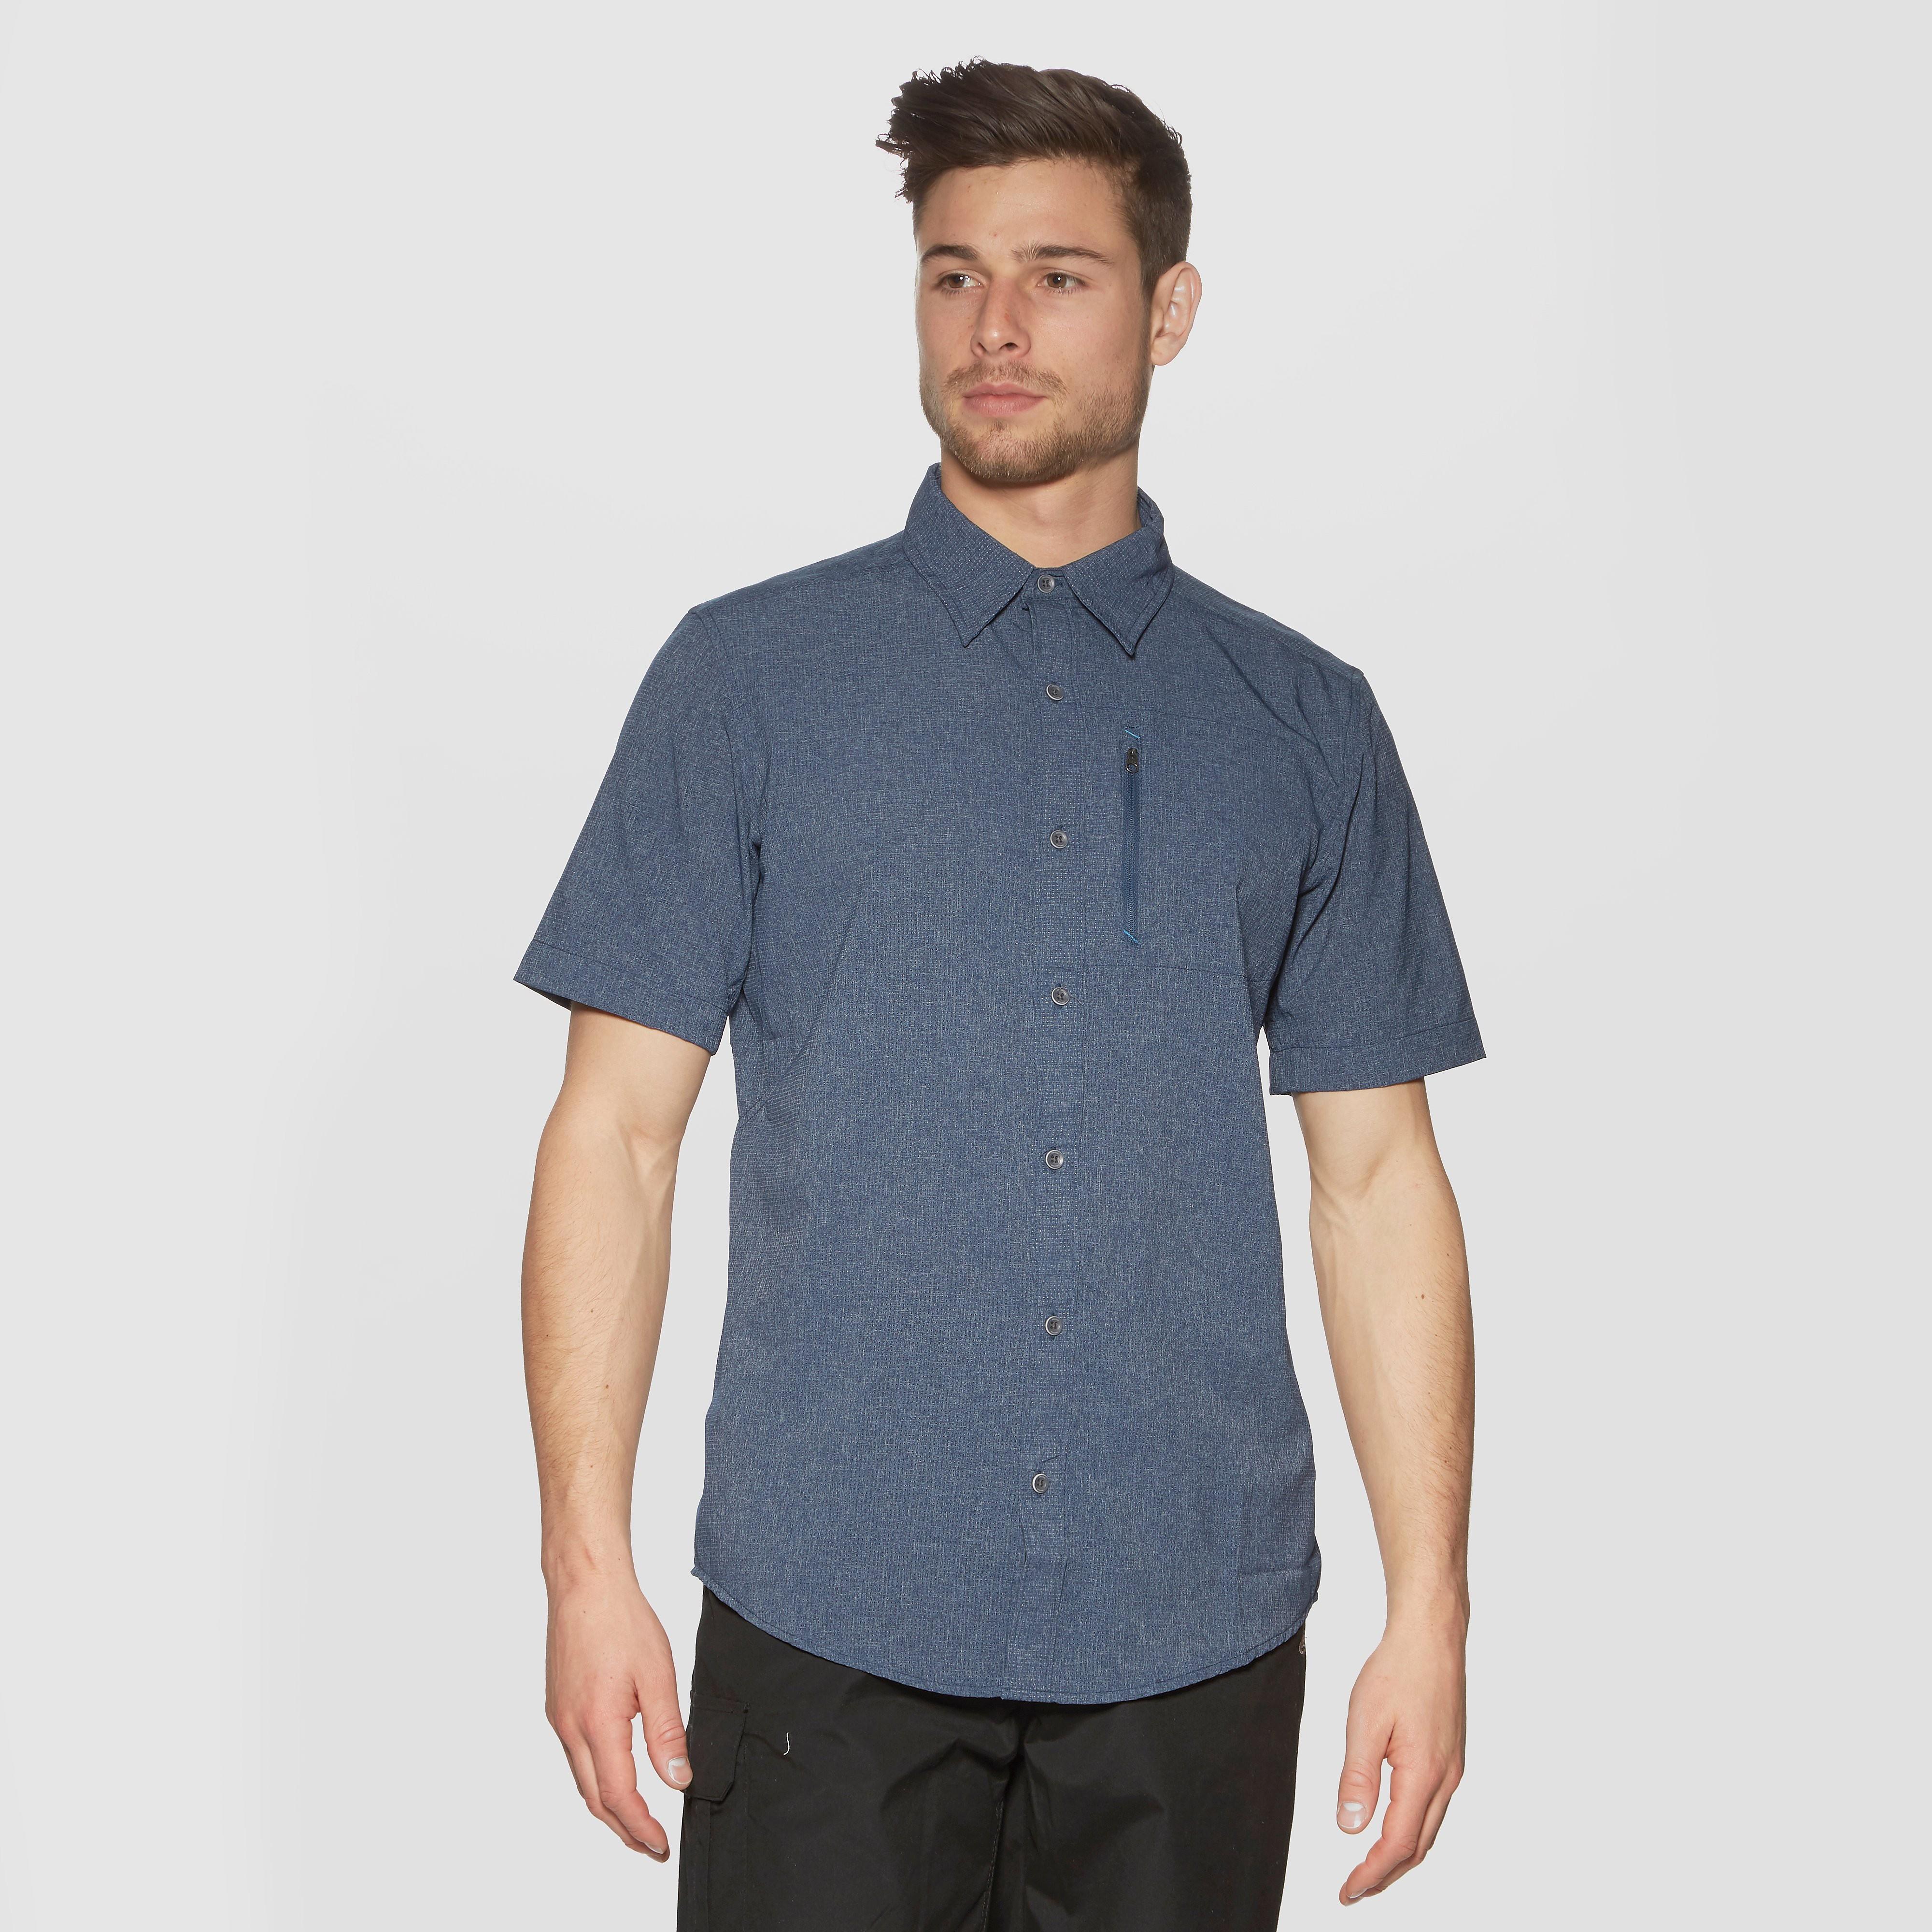 Marmot Caecius SS Men's Shirt